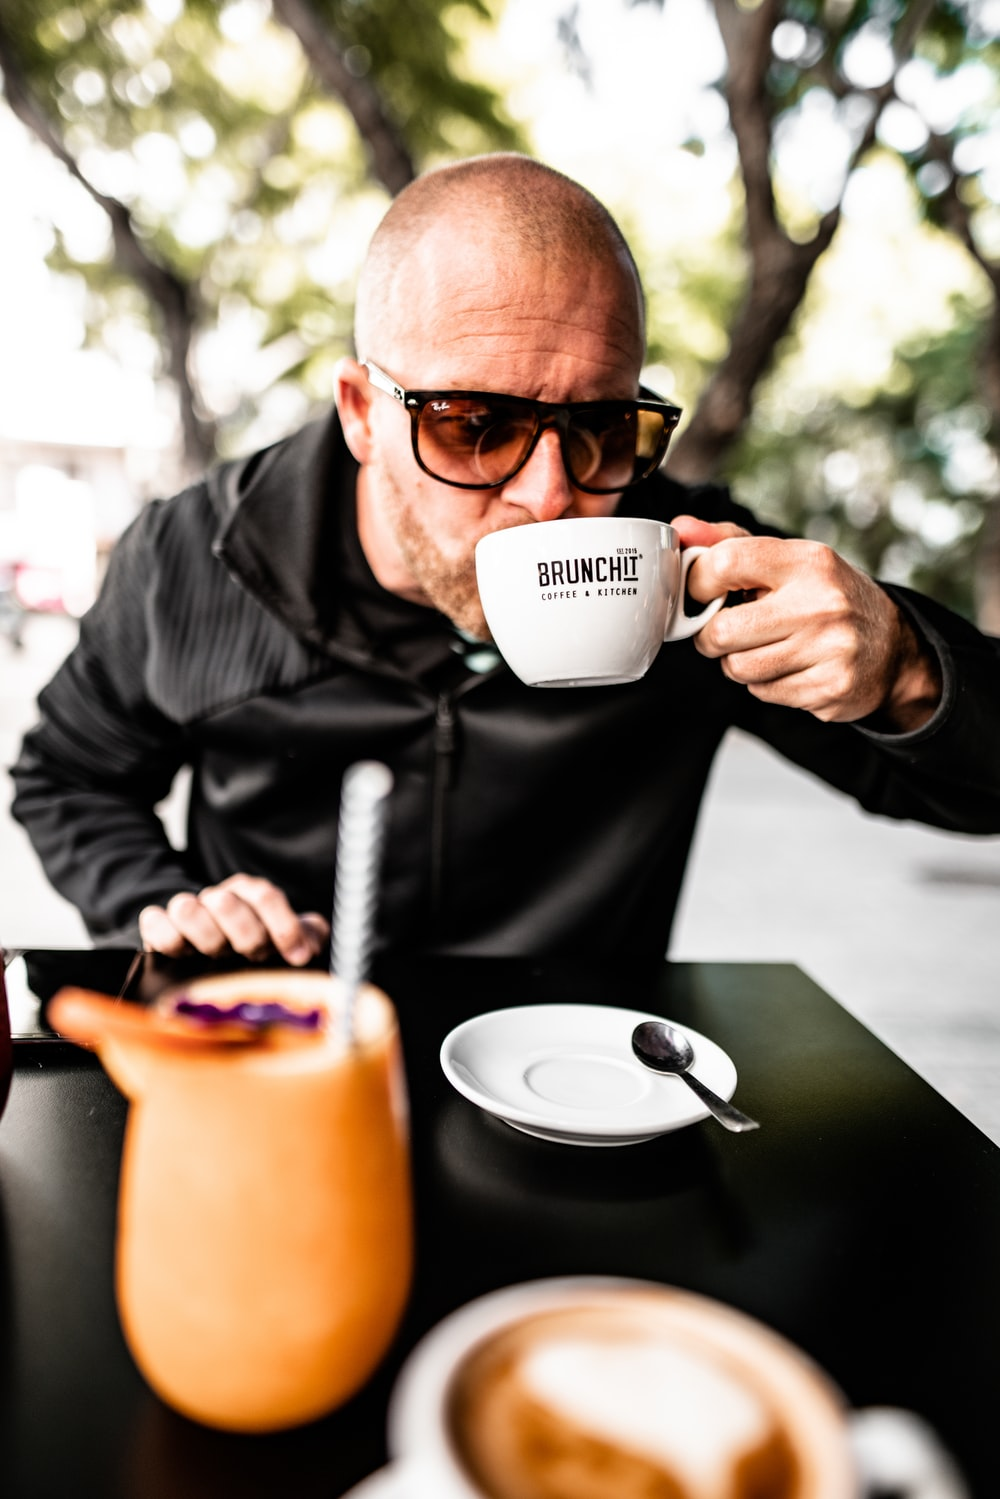 shallow focus photo of man drinking on white ceramic mug